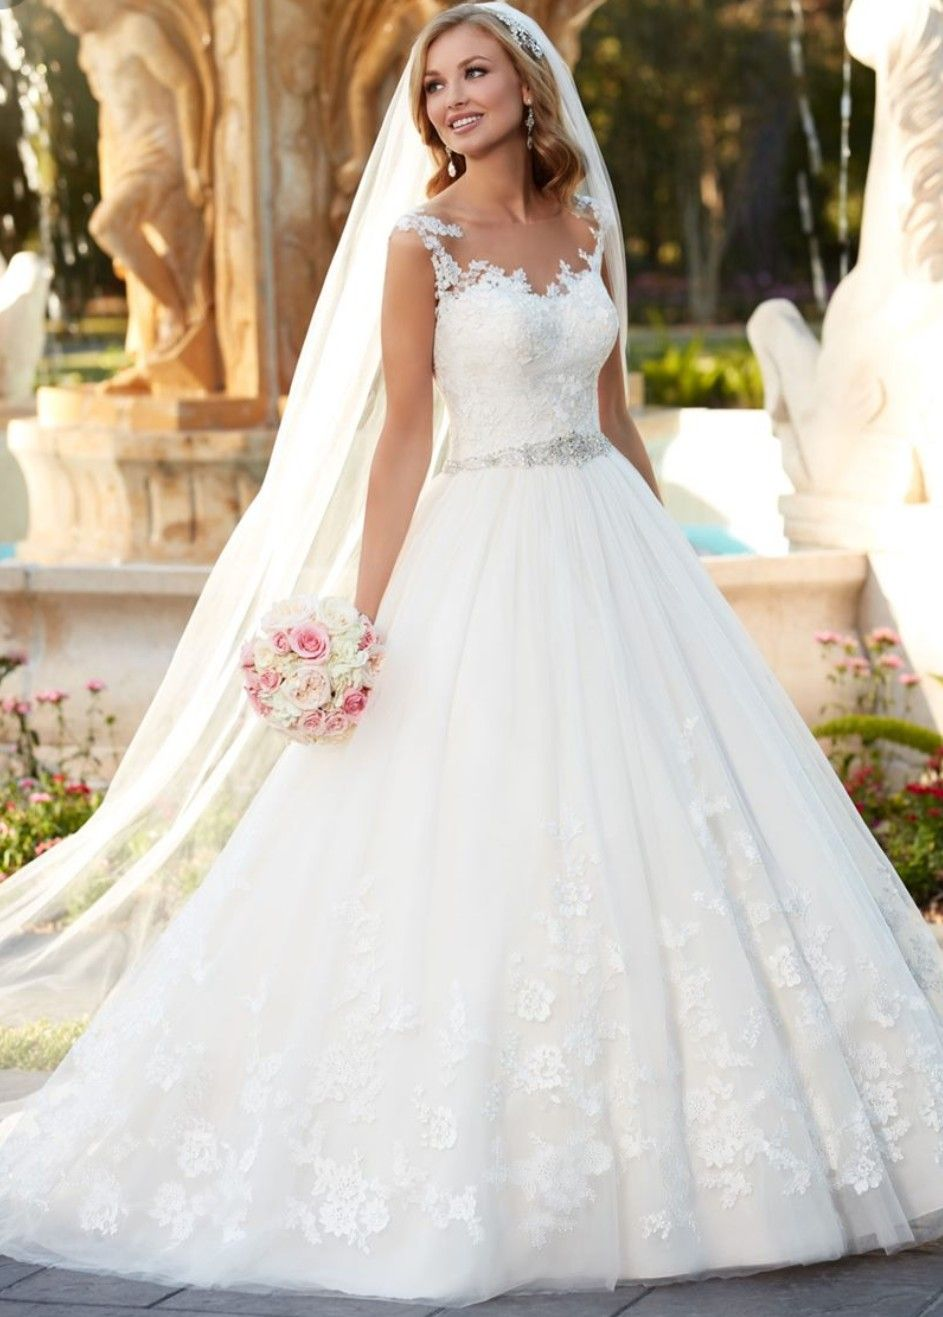 Cheap rustic wedding dresses  Pin by Aarohi Mathur on Wedding dresses  Pinterest  Wedding